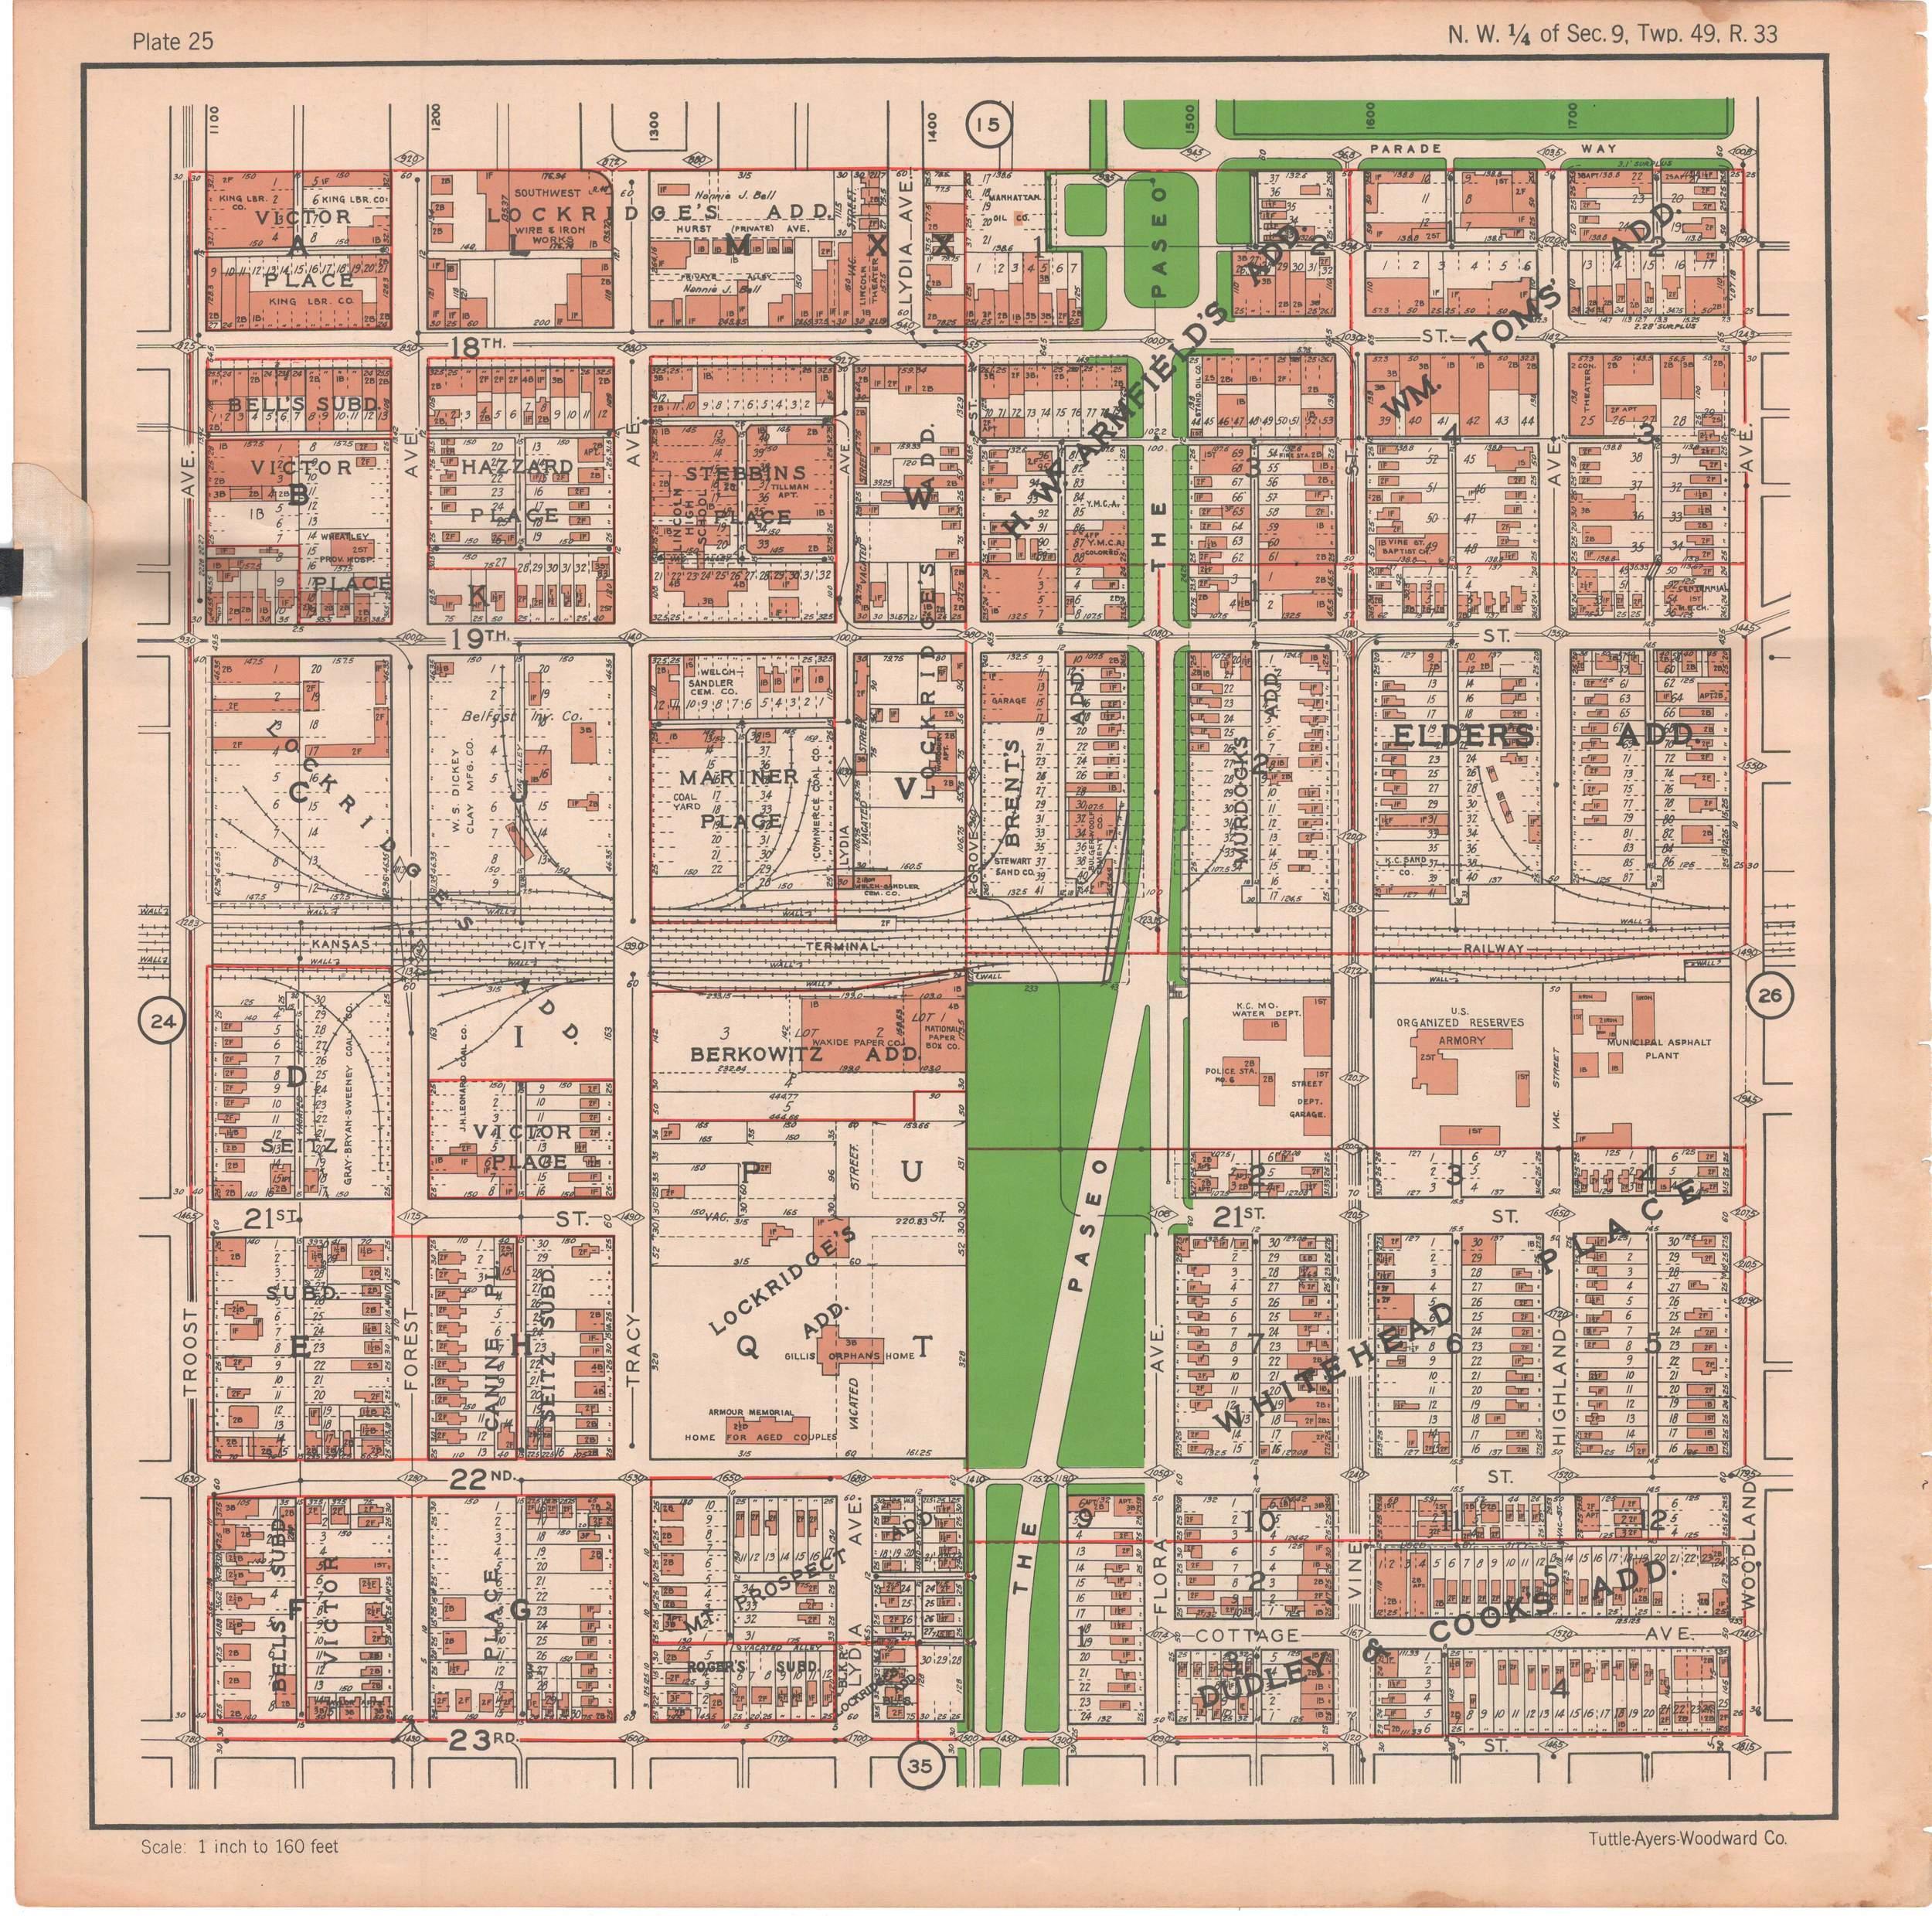 1925 TUTTLE_AYERS_Plate 25.JPG